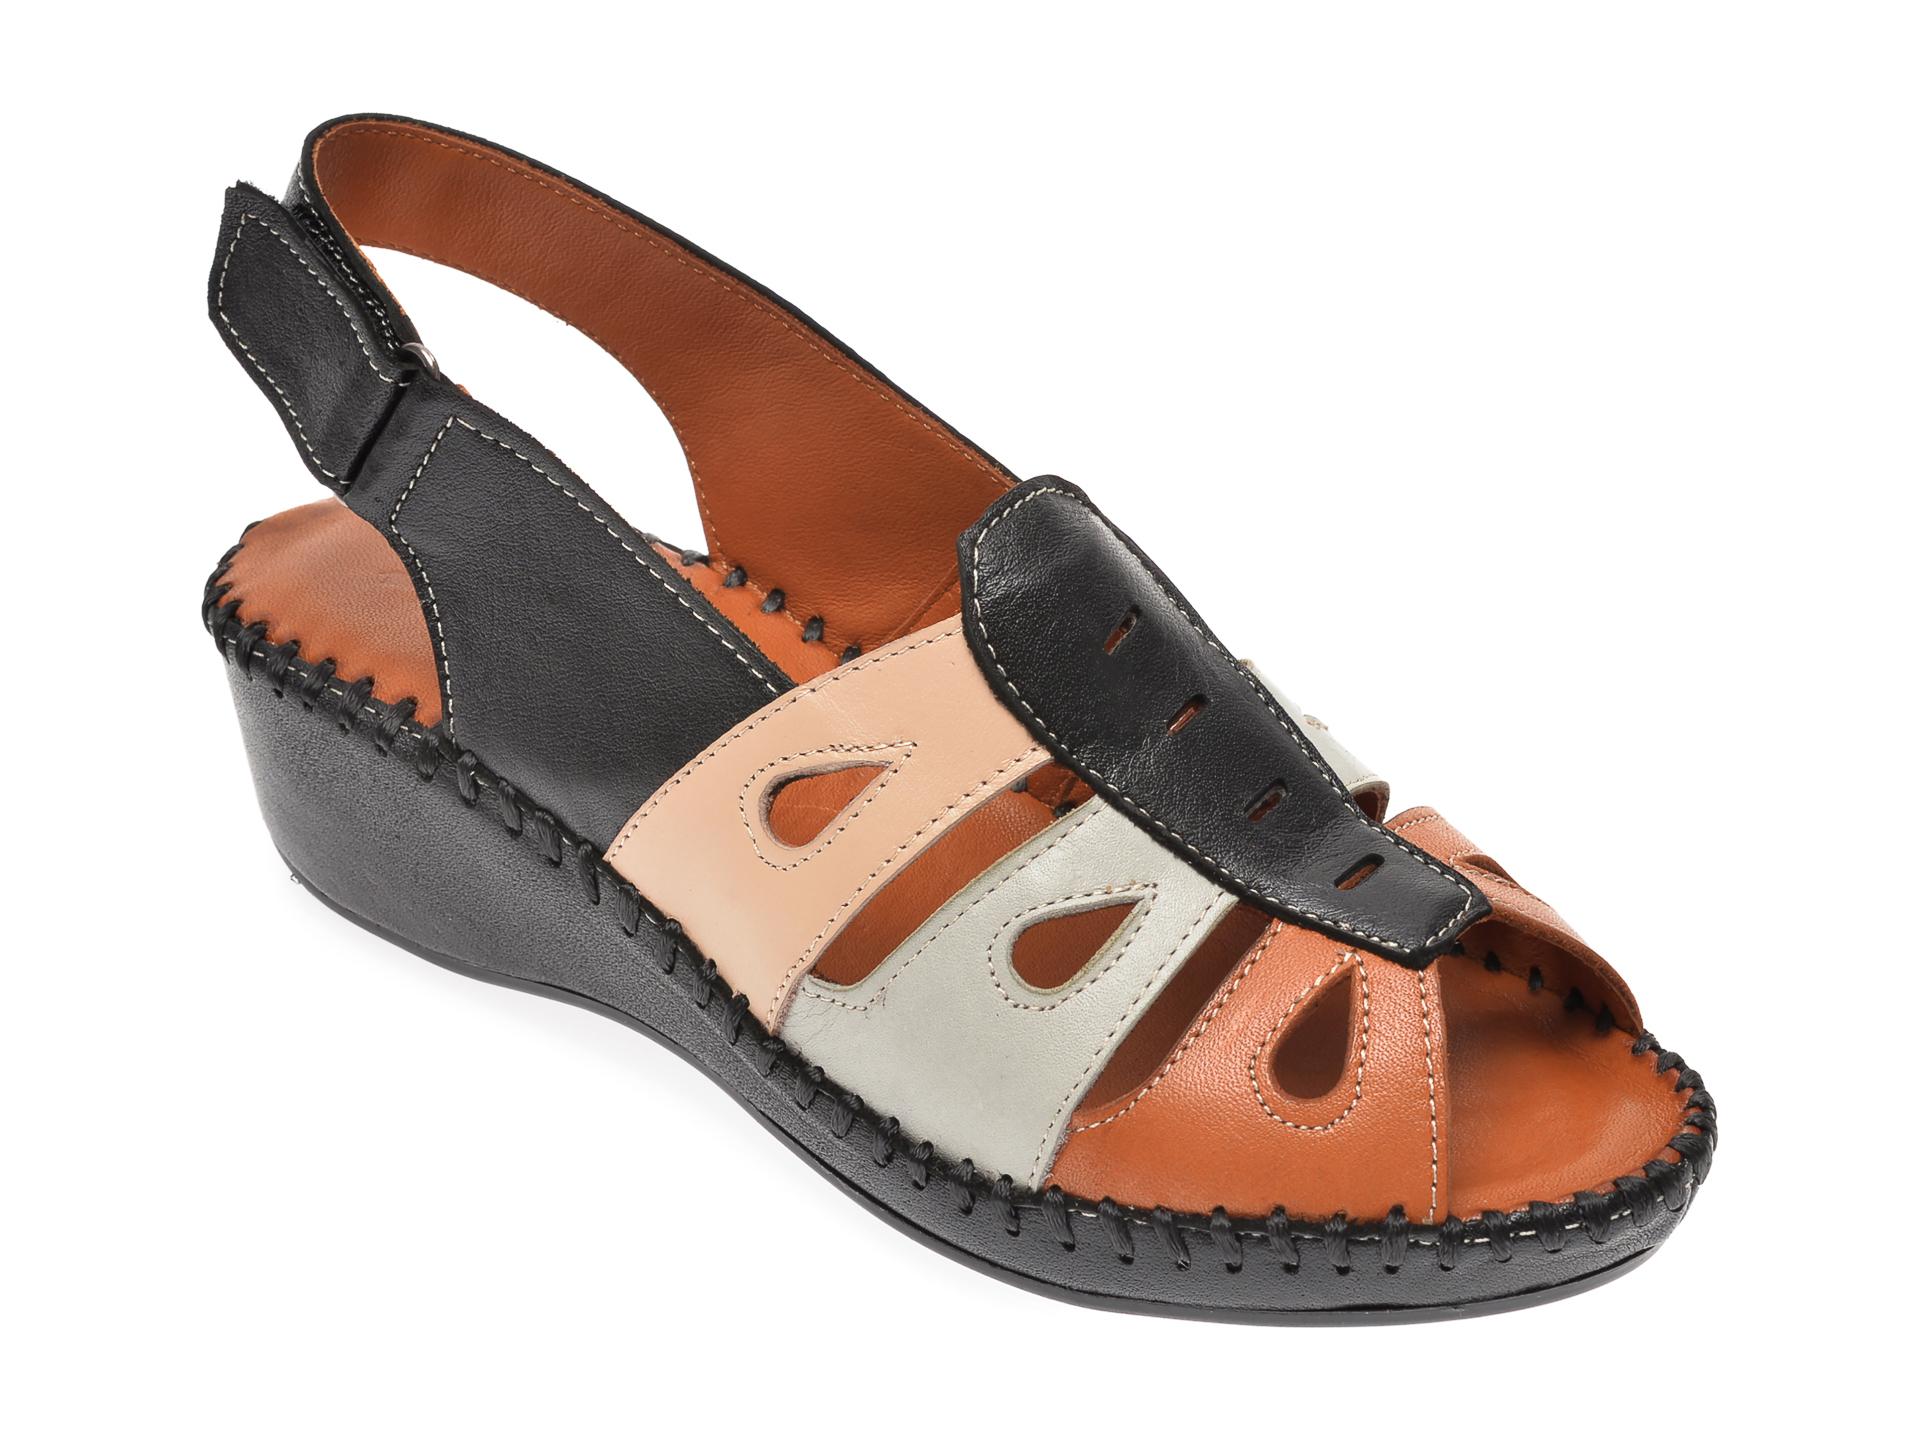 Sandale PASS COLLECTION negre, 3166, din piele naturala